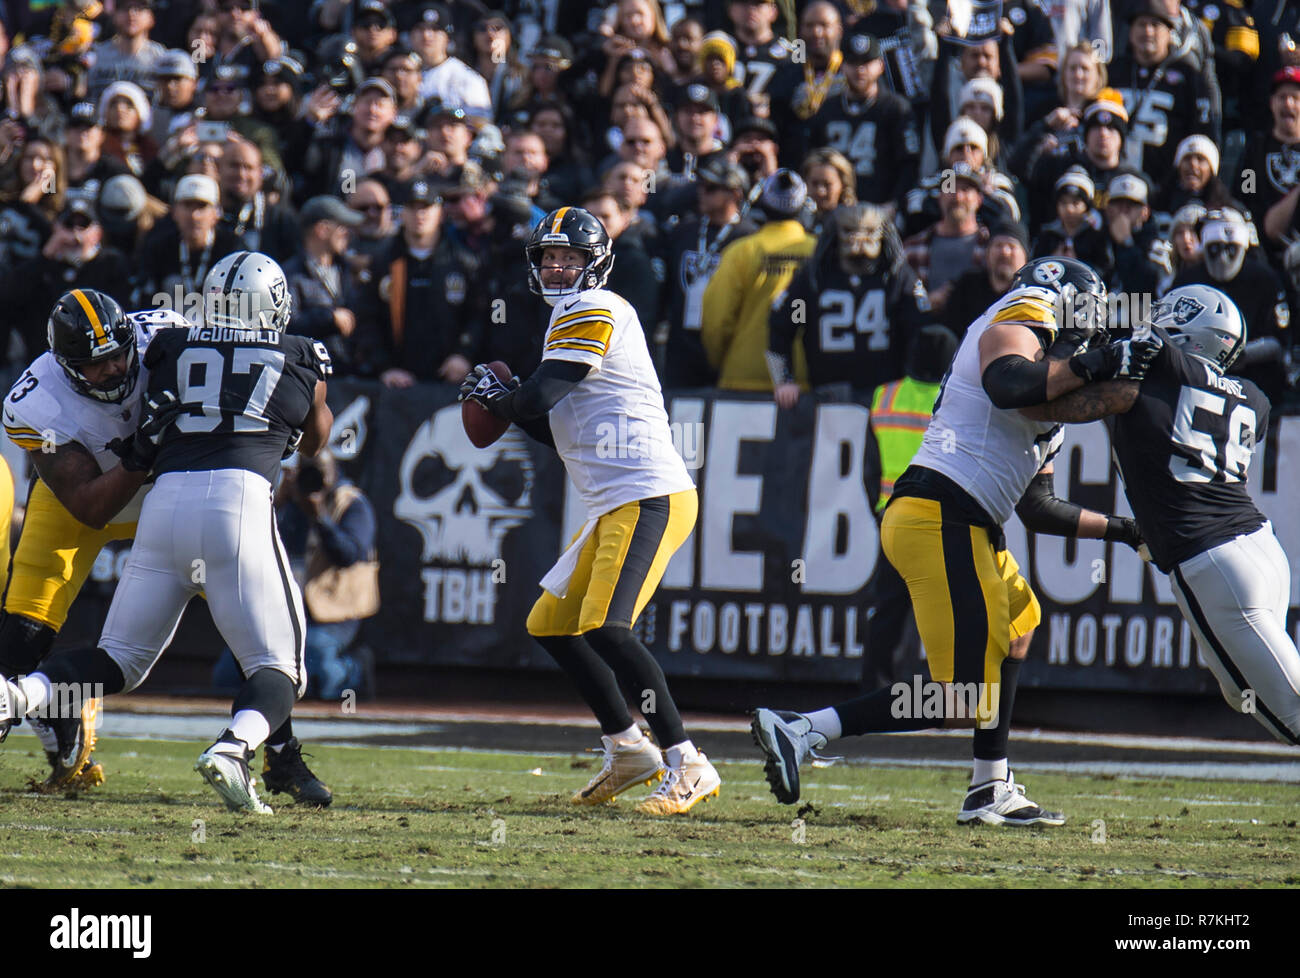 Dec 09 2018 Oakland U.S.A CA Pittsburgh Steelers quarterback Ben Roethlisberger (7) looks for the deep pass during the NFL Football game between Pittsburgh Steelers and the Oakland Raiders 21-24 lost at O.co Coliseum Stadium Oakland Calif. Thurman James/CSM - Stock Image